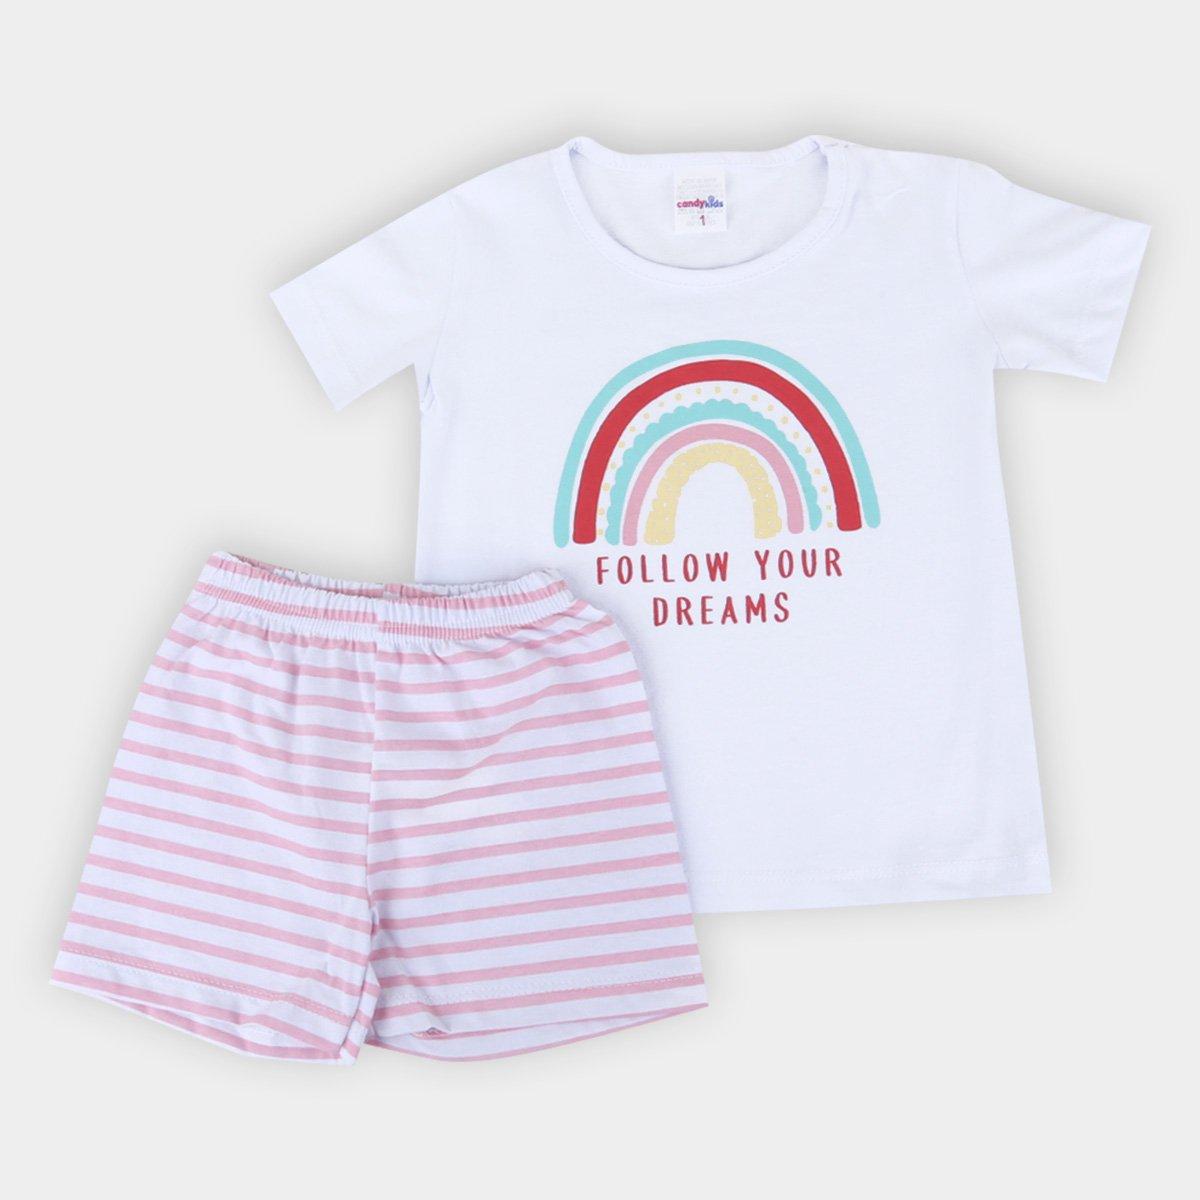 Pijama Infantil Candy Kids Curto Listrado Follow Your Dreams Feminino